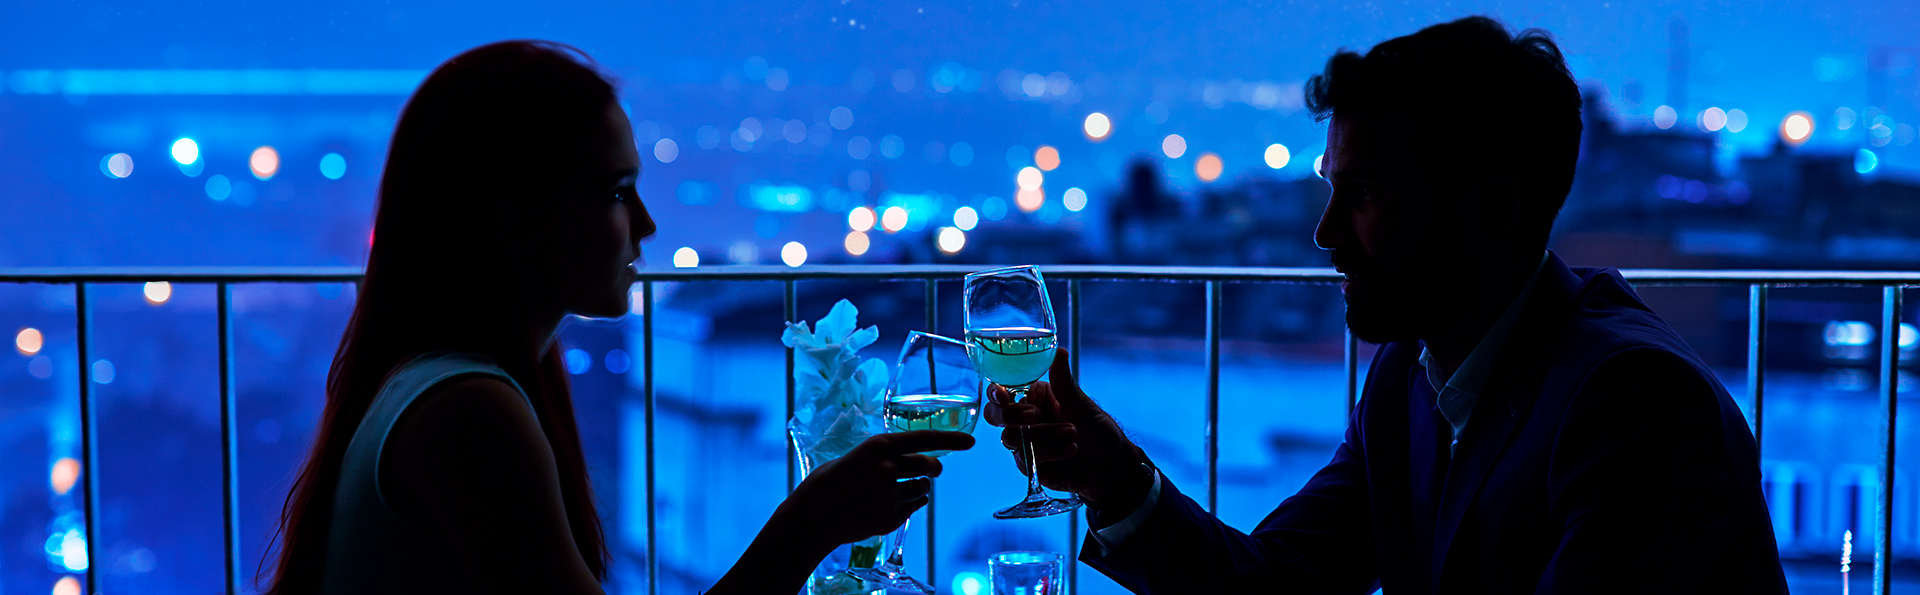 Escapada con Cena romántica, Visita a bodega y detalles en Pamplona